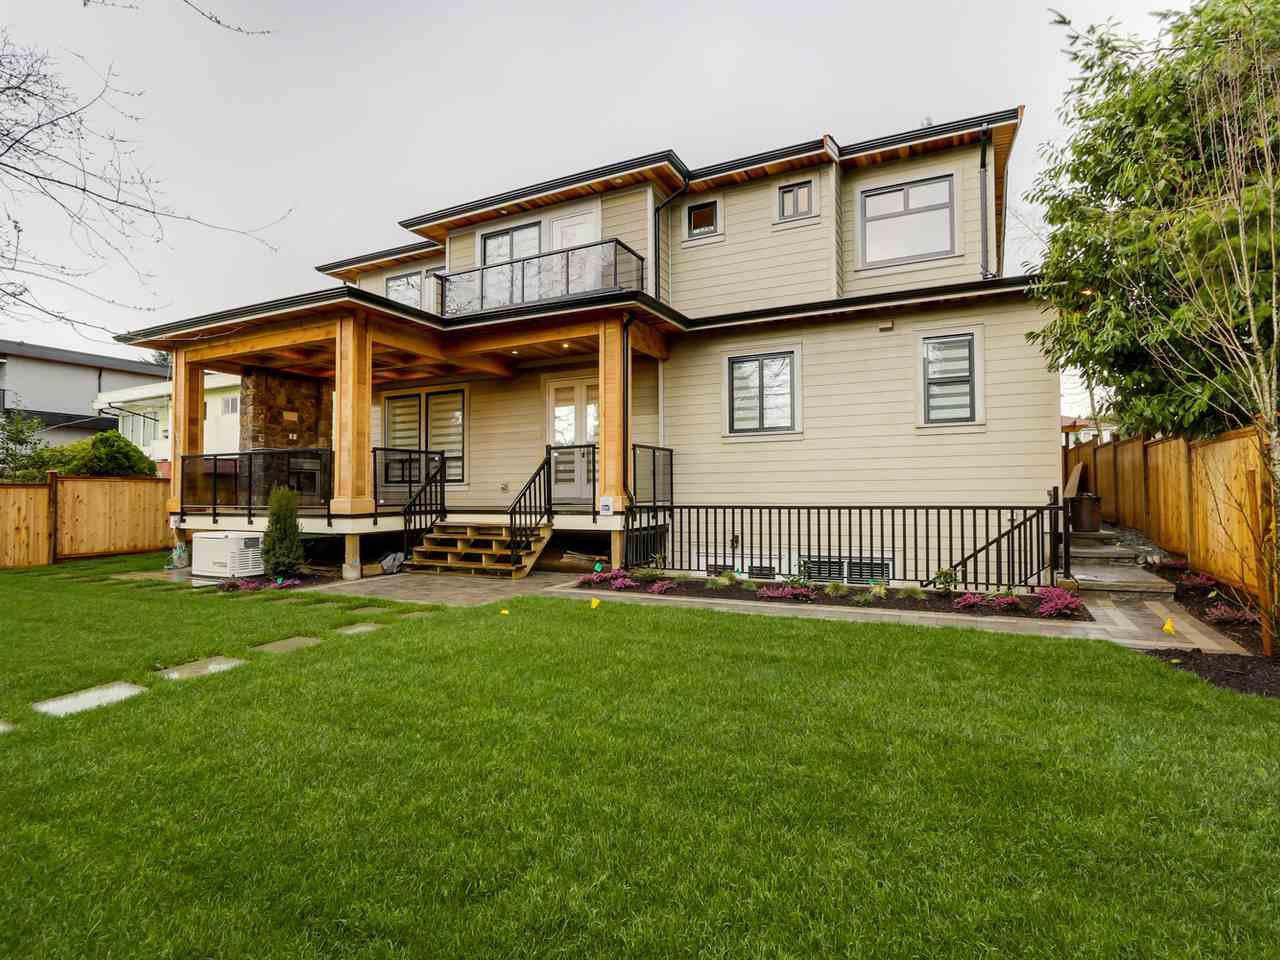 Photo 20: Photos: 1560 MAPLE Street: White Rock House for sale (South Surrey White Rock)  : MLS®# R2138926